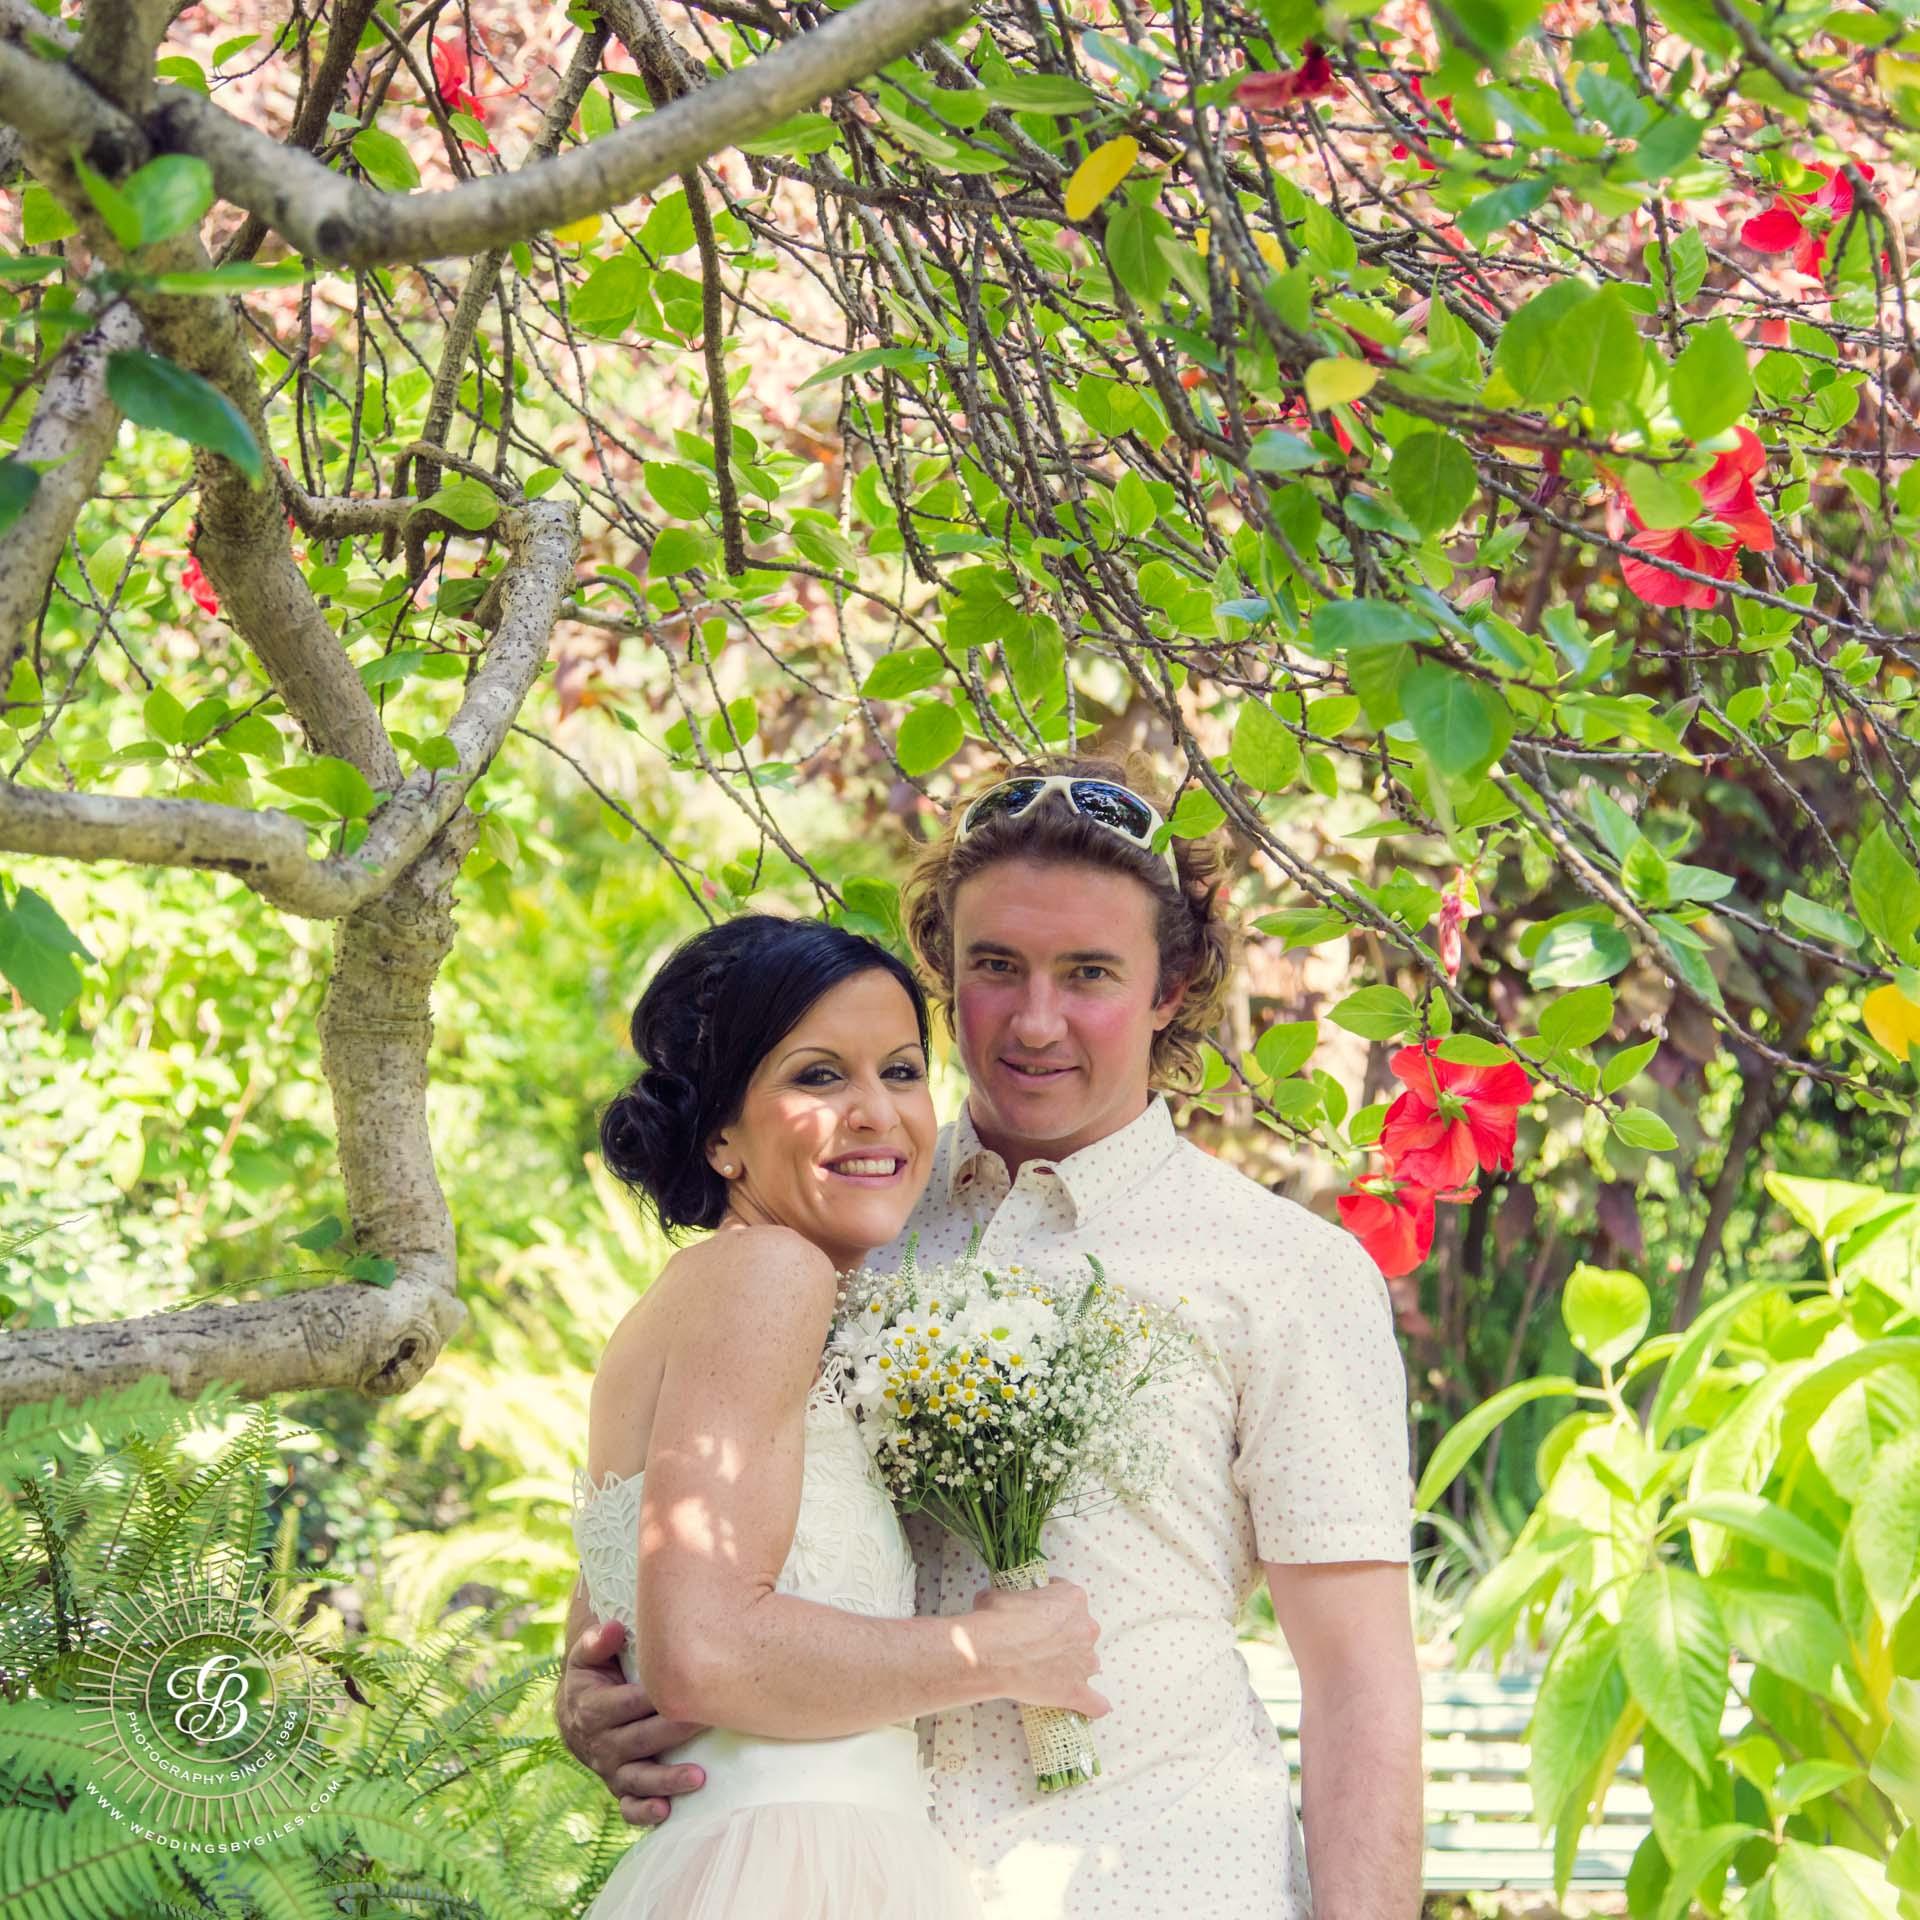 Wedding portrait in tropical garden